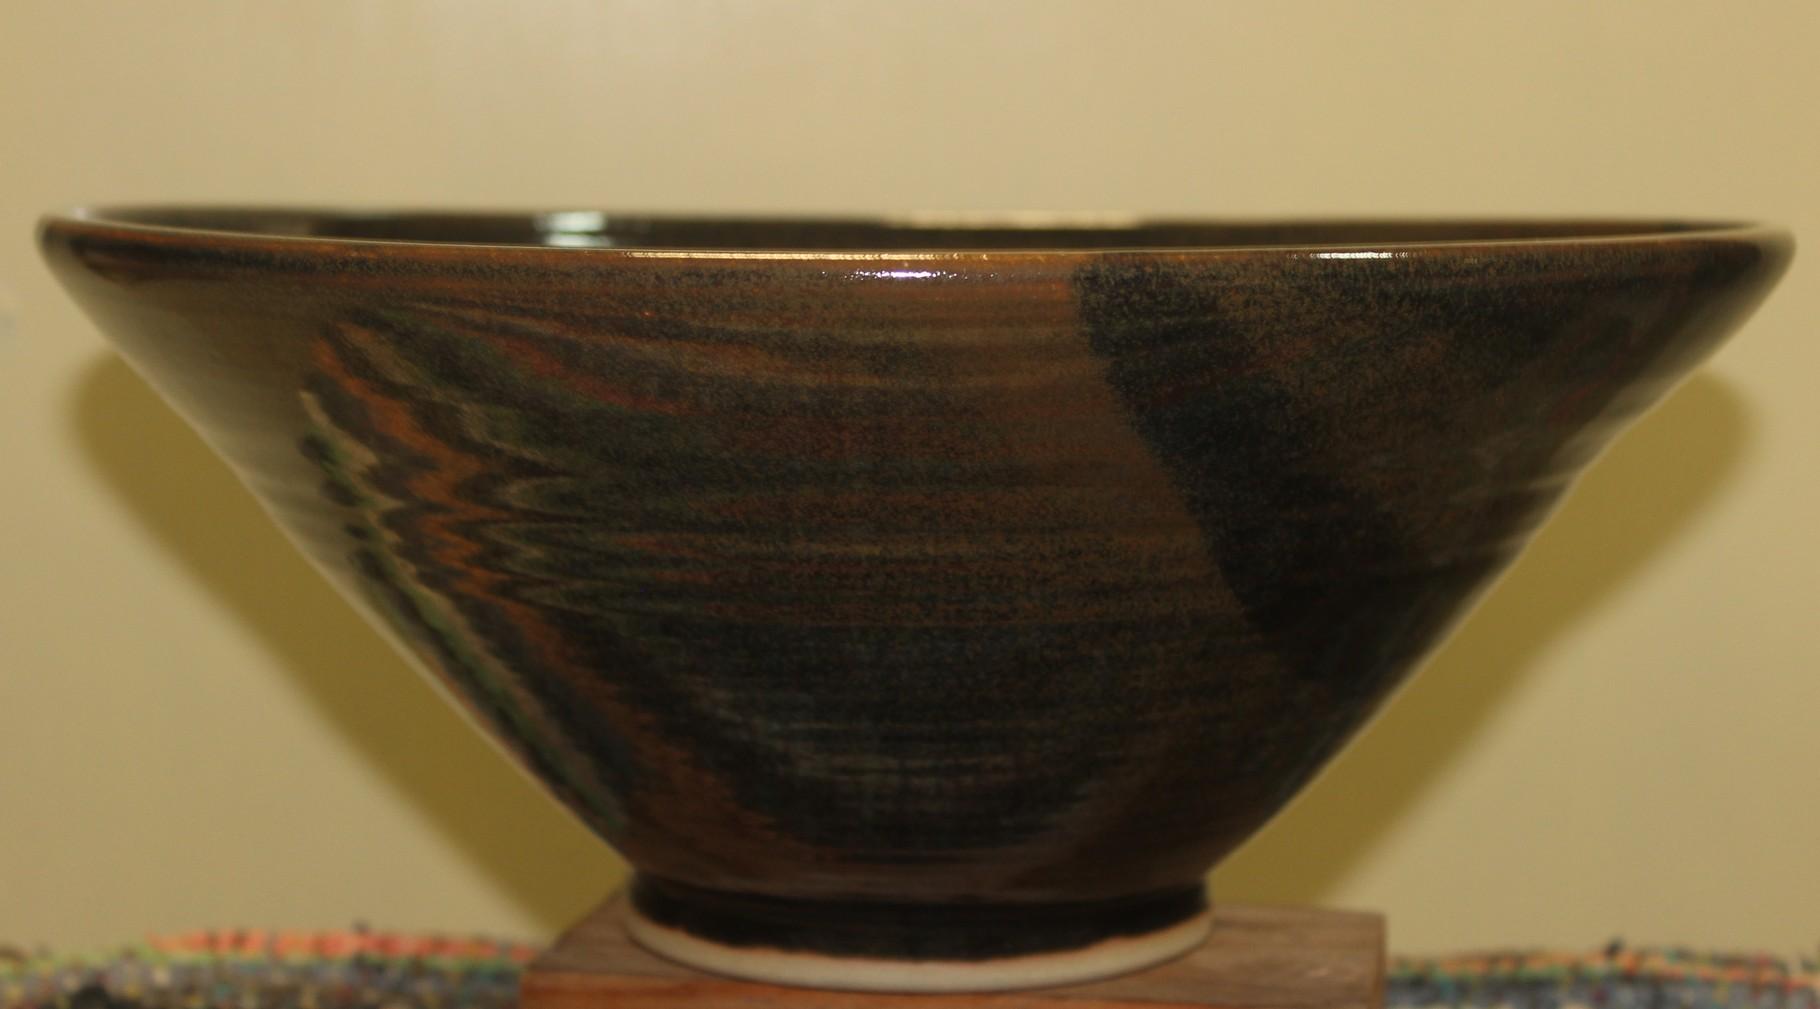 Oversized Serving/Decorative Bowl